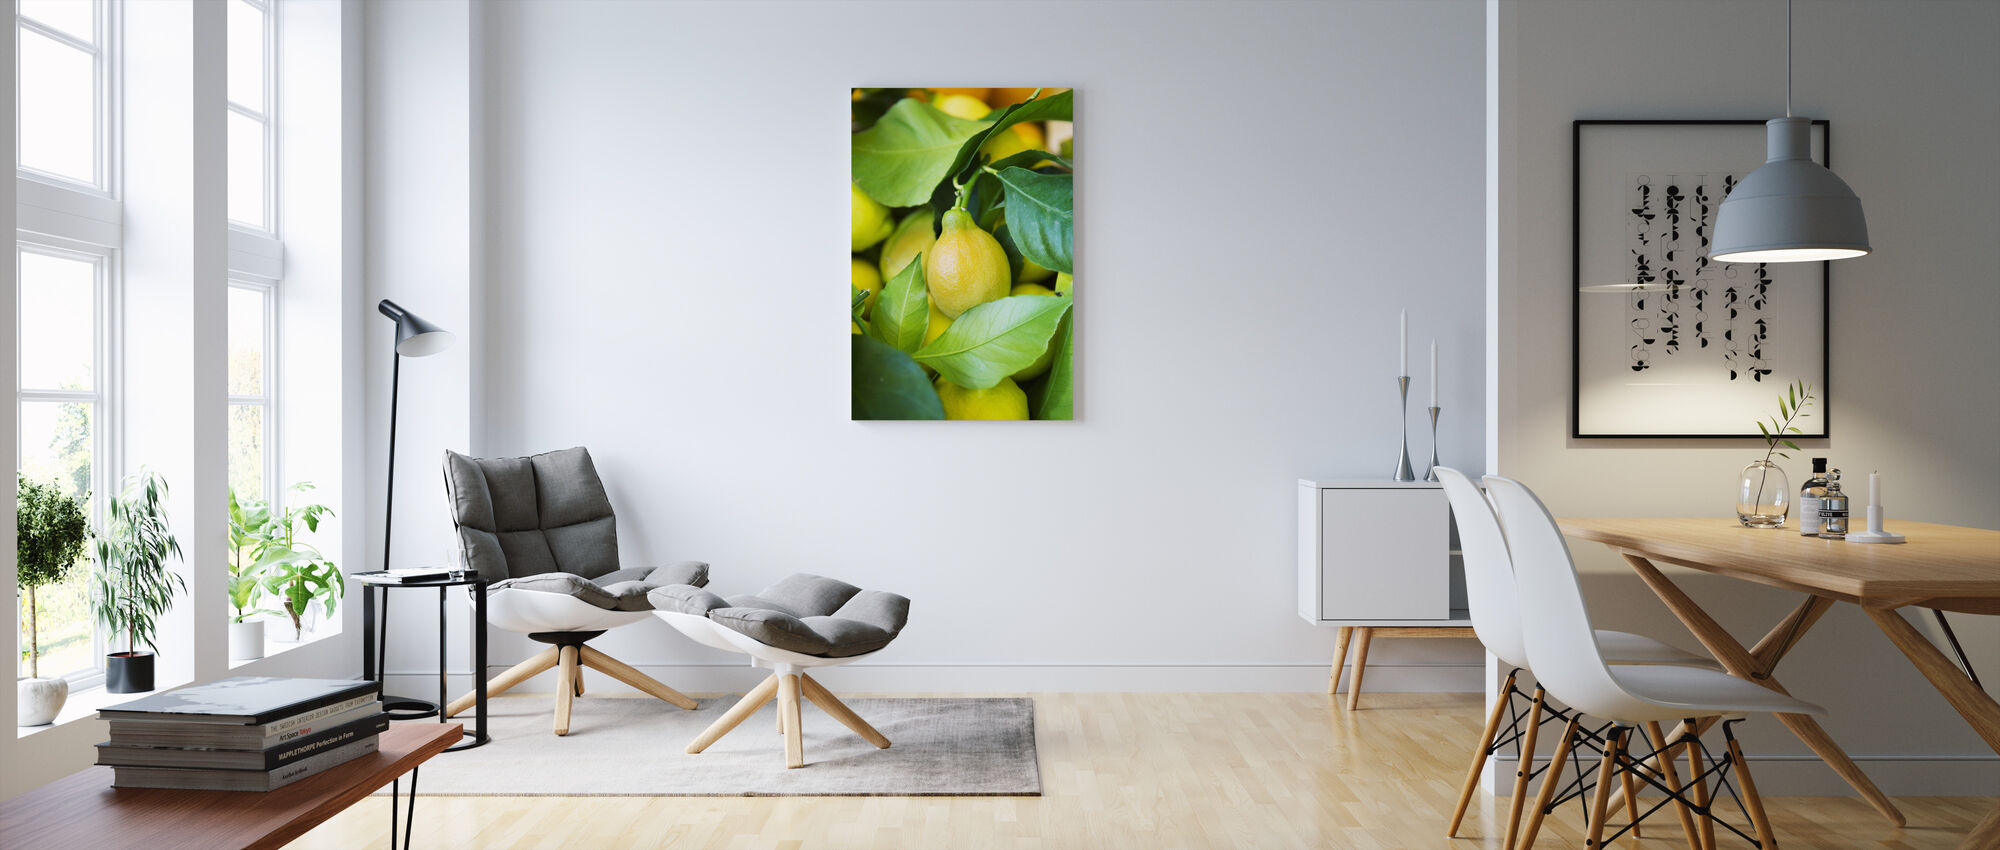 French Lemon - Canvas print - Living Room